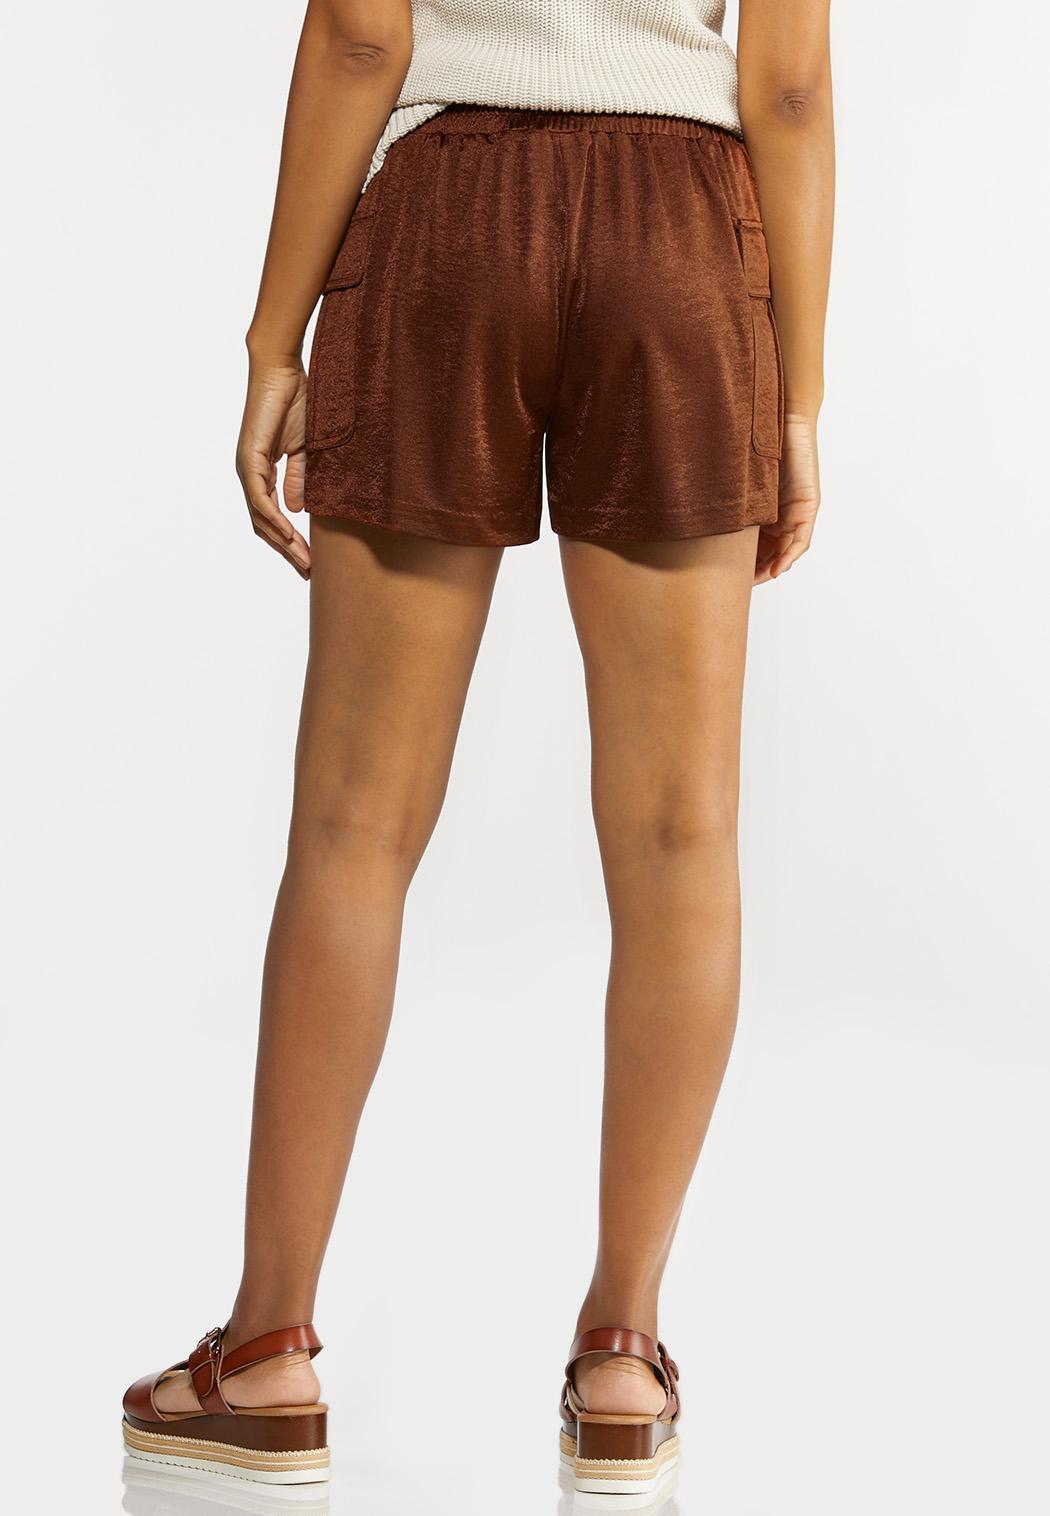 Satin Utility Shorts (Item #44289015)